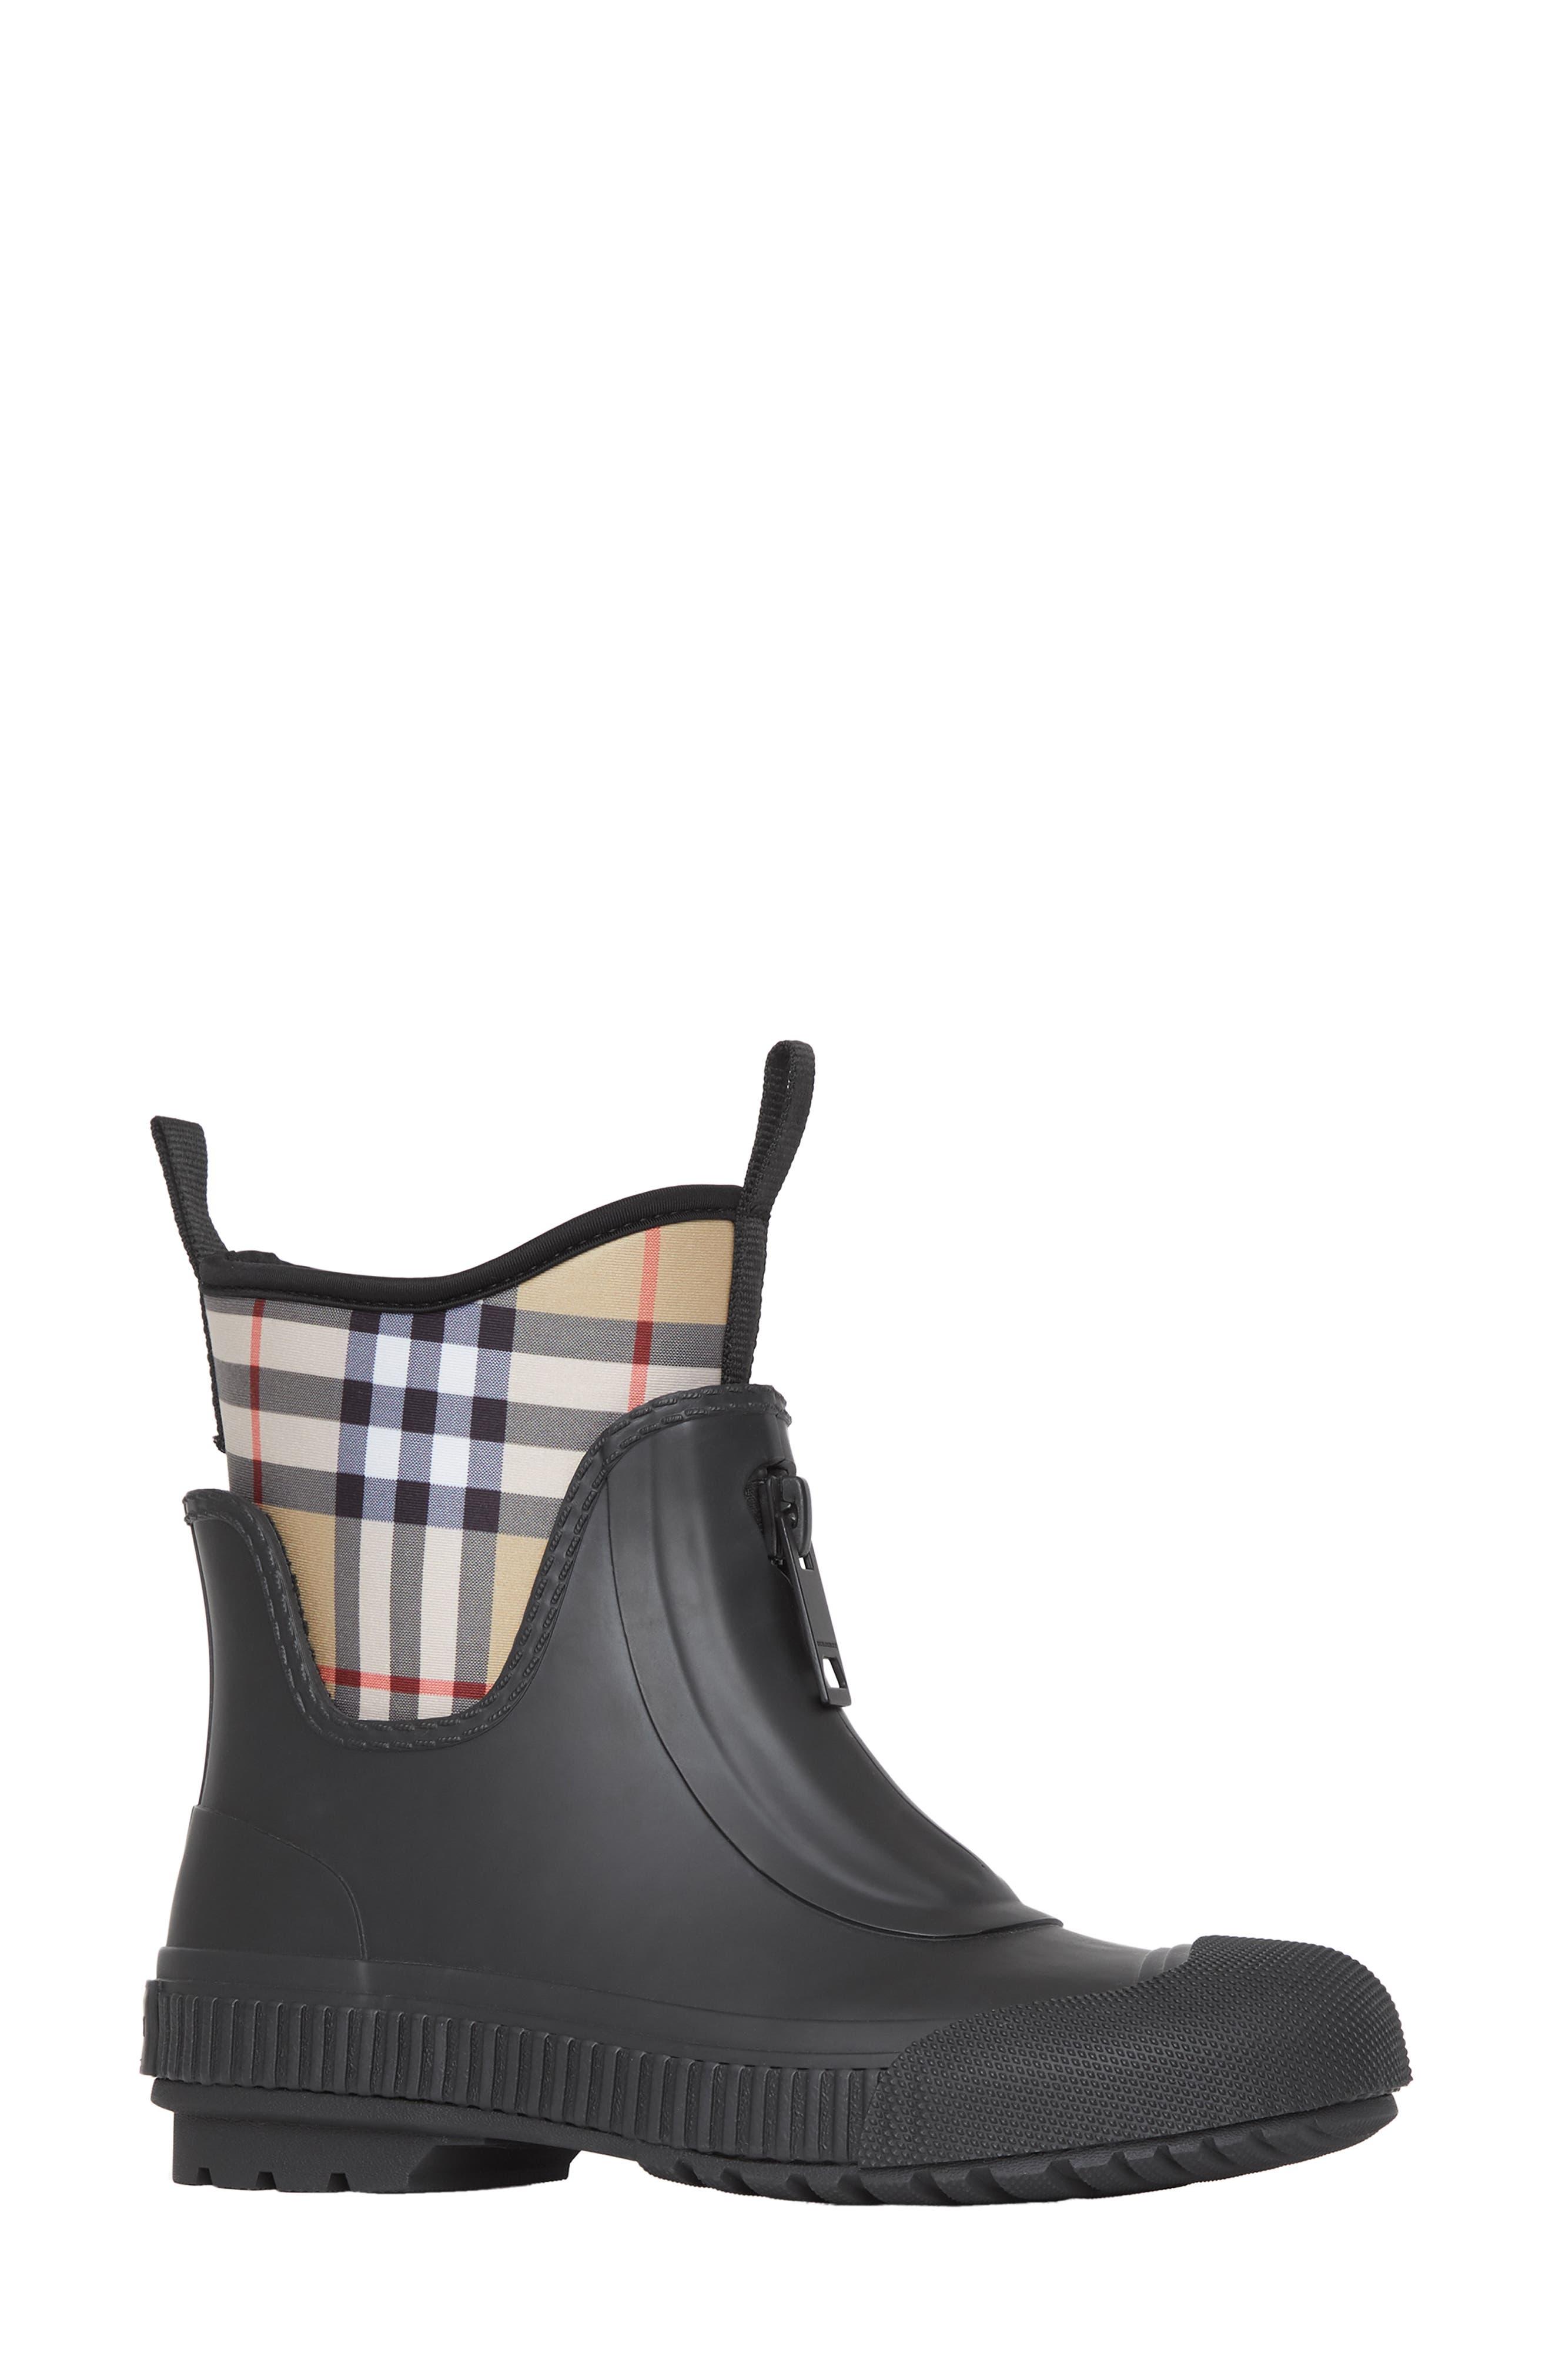 Women's Burberry Boots | Nordstrom